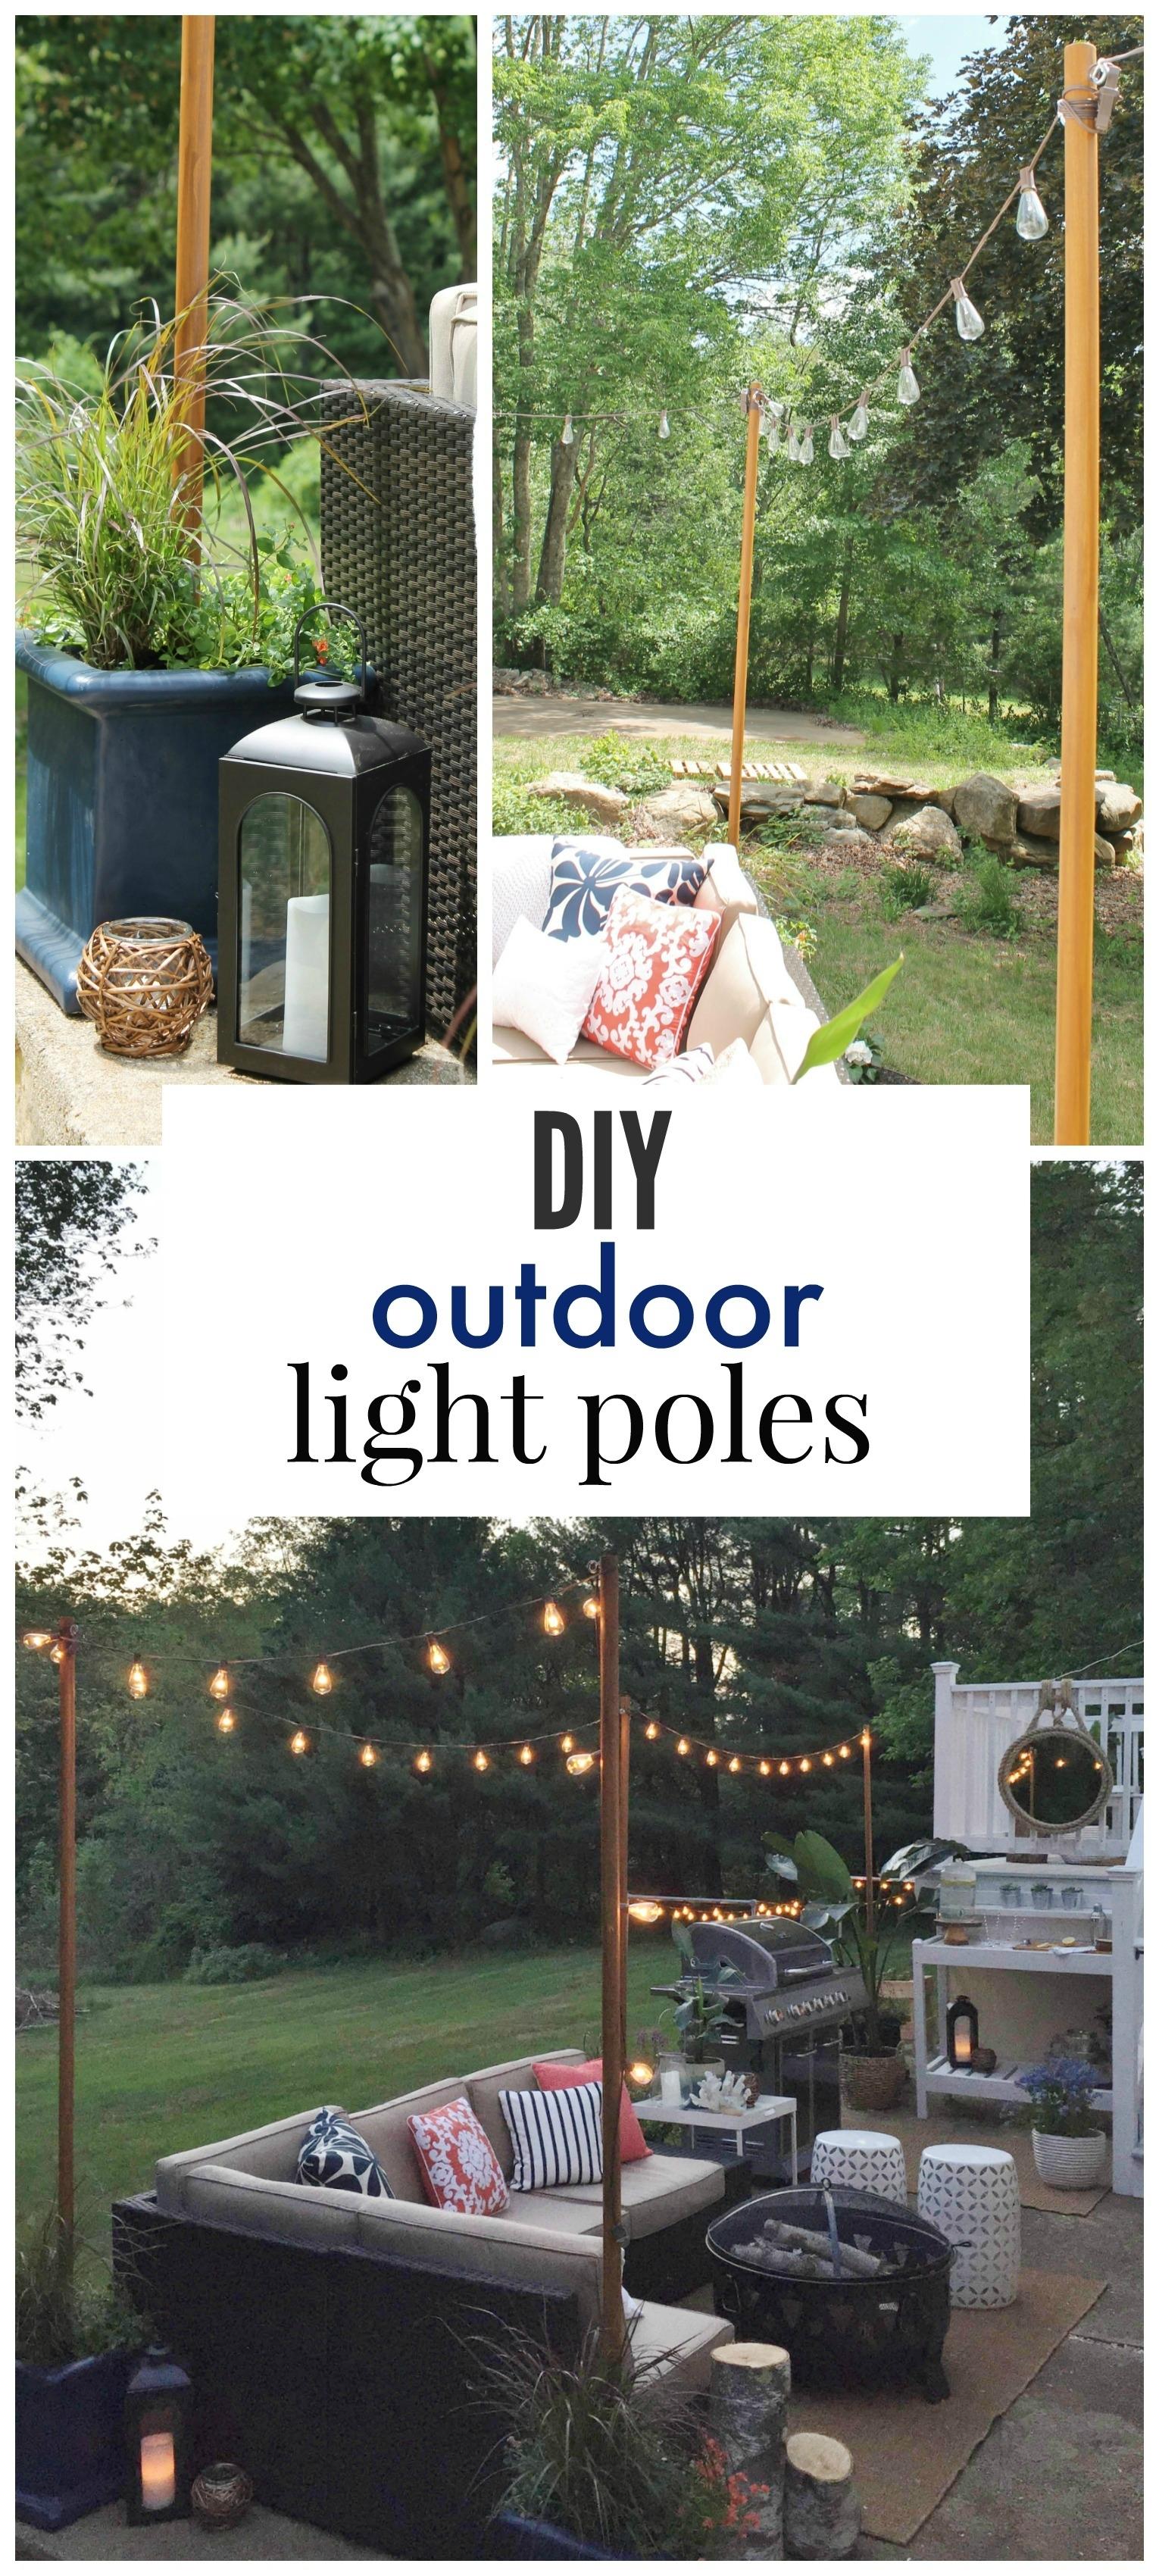 Diy Outdoor Light Poles - City Farmhouse with Outdoor Empty Lanterns (Image 4 of 20)